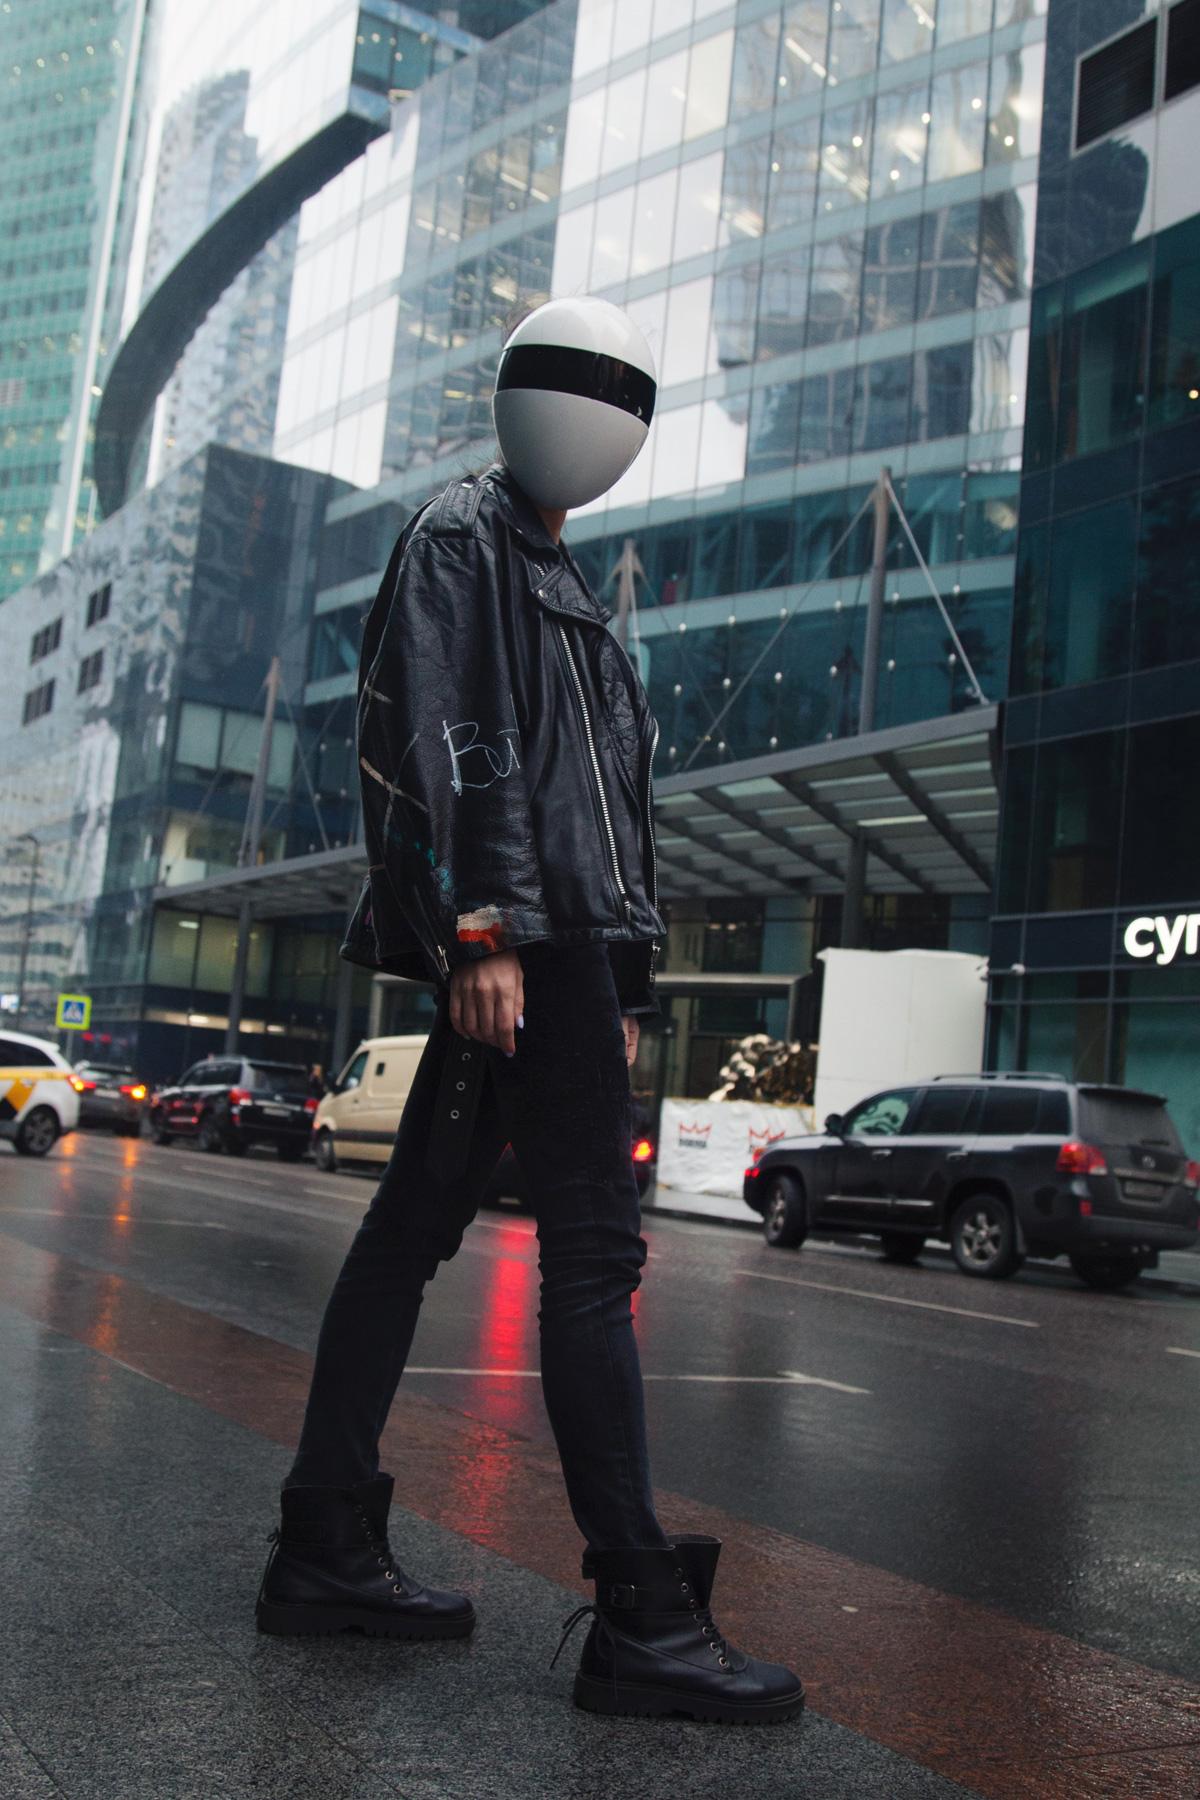 BLANC Full Face Modular Mask